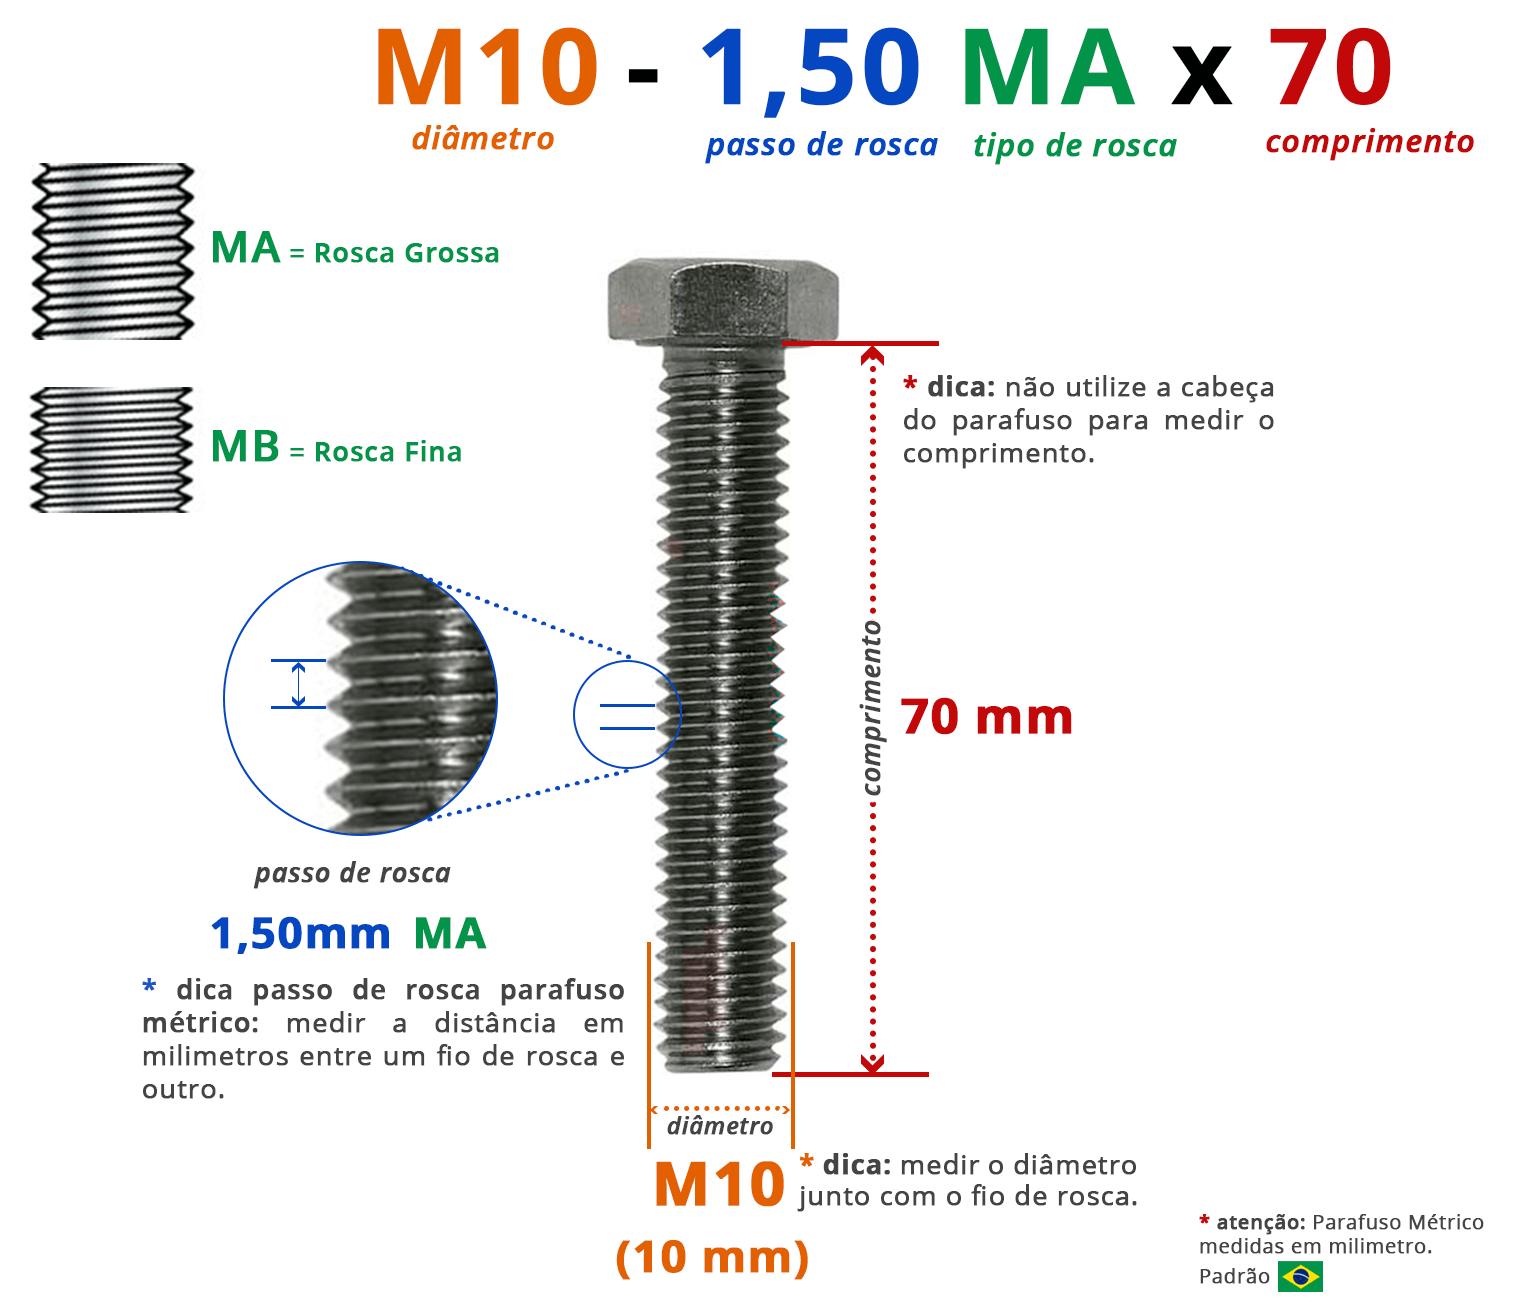 PARAFUSO SEXTAVADO ROSCA INTEIRA M10 1,50 MA X 70 DIN 933 INOX A4